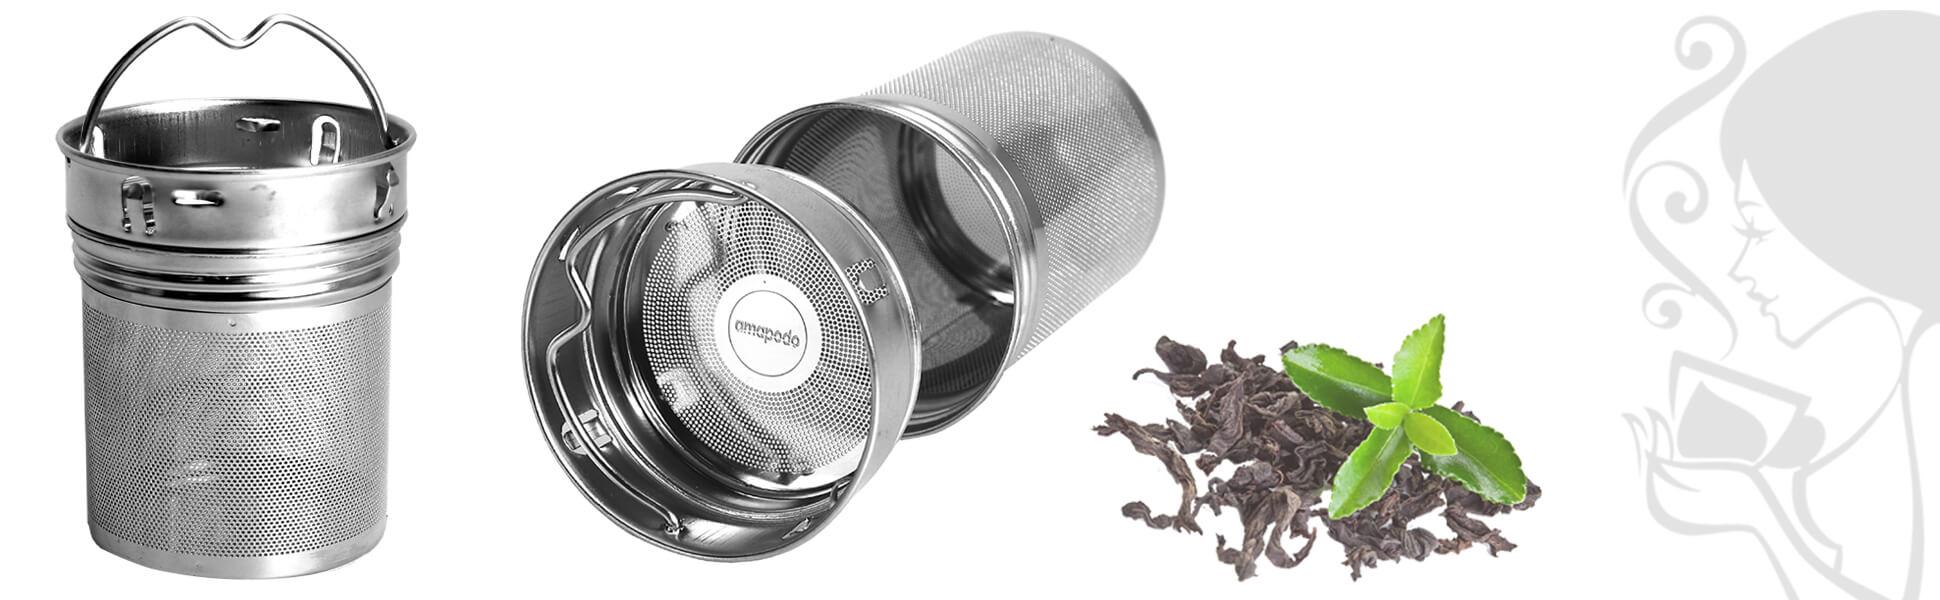 Metal strainer for tea